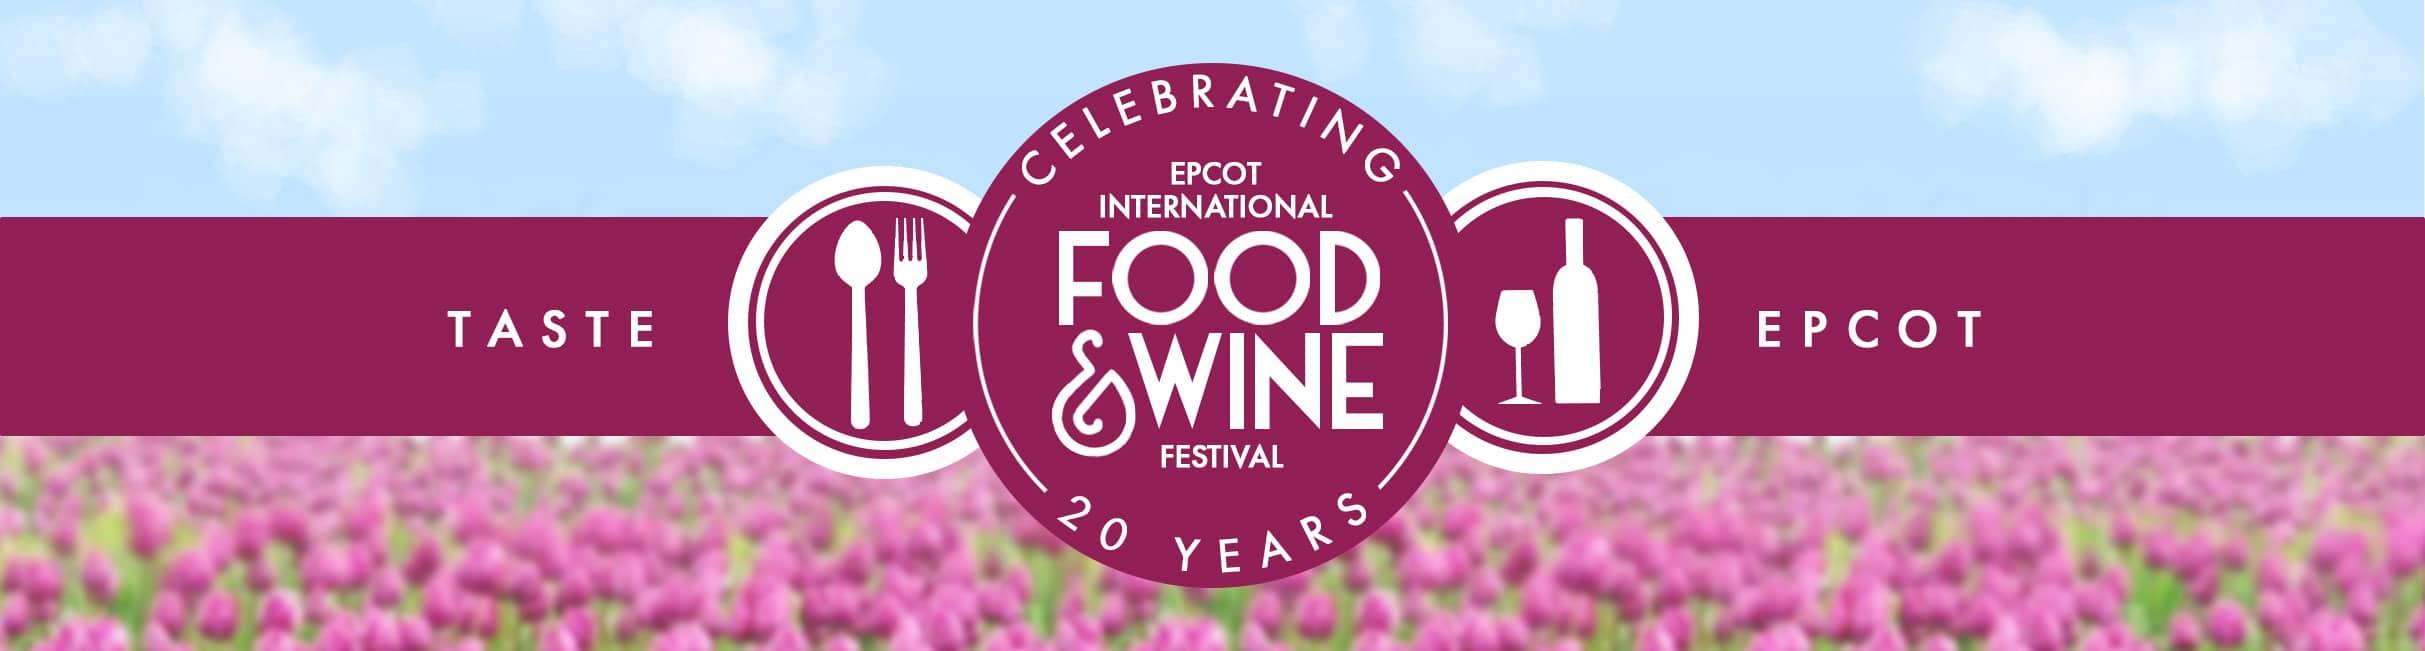 Epcot-Food&Wine